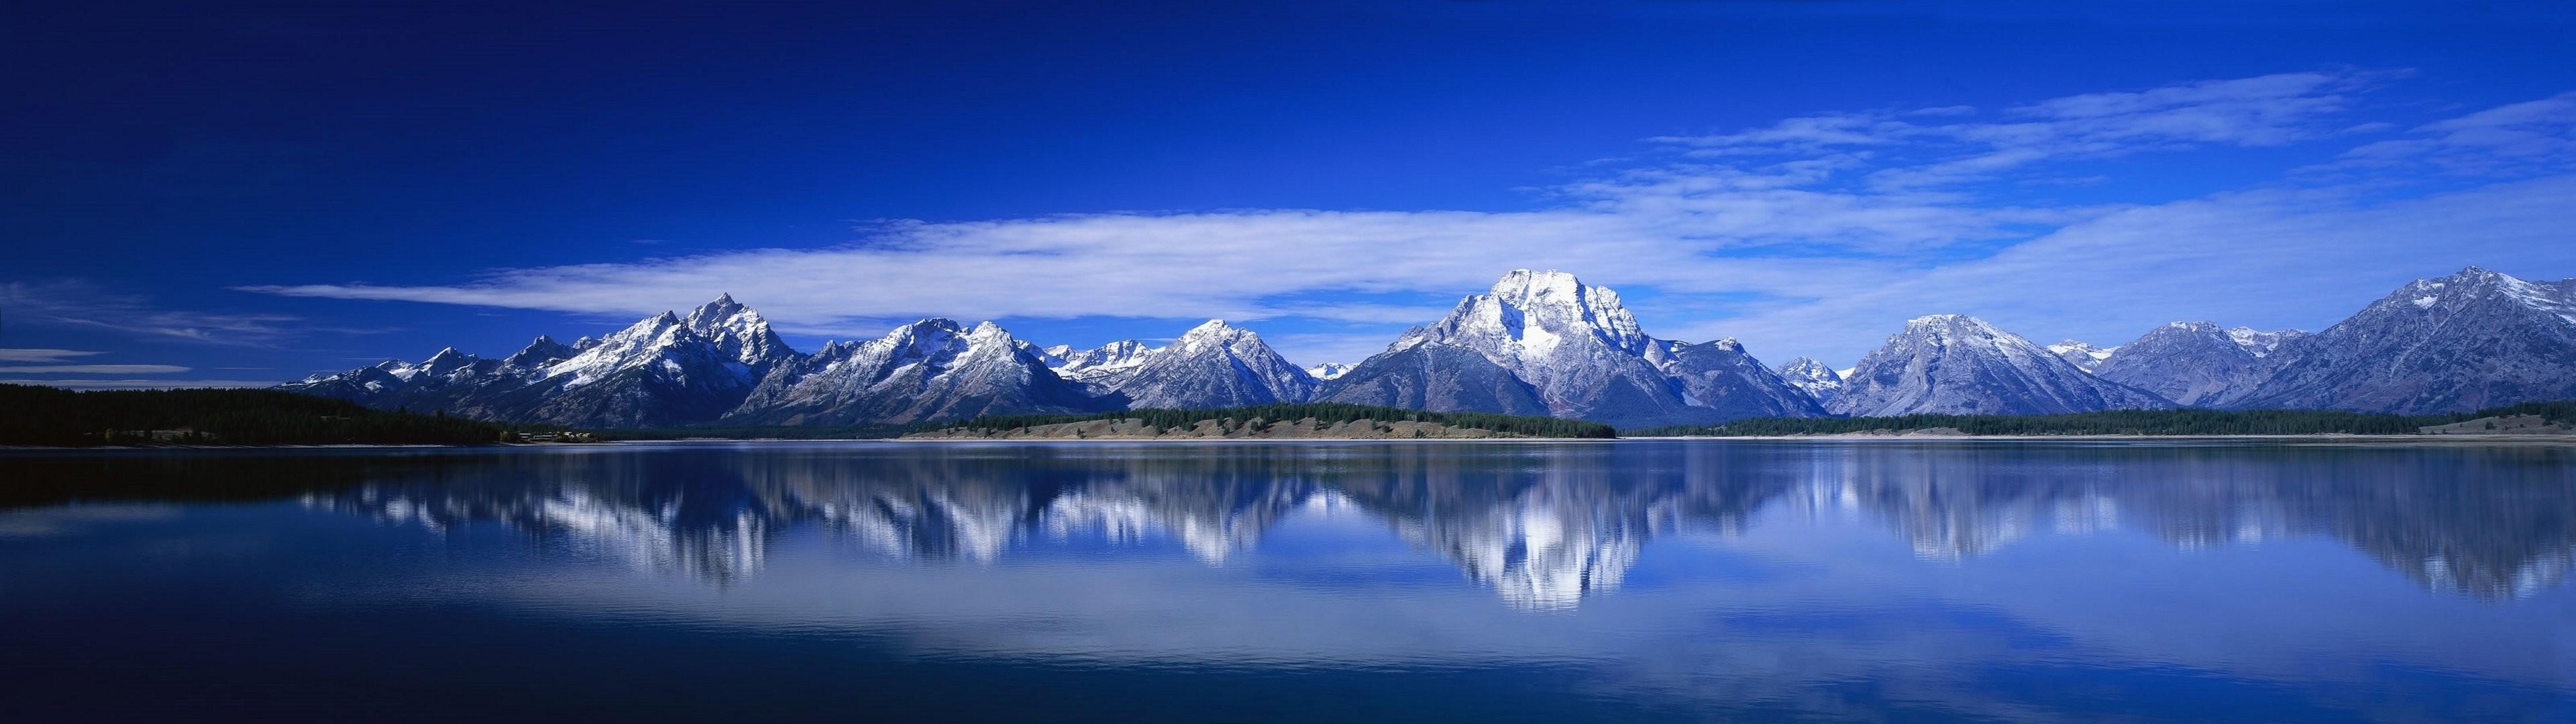 Mountains Dual Screen Wallpaper | | ID:53326